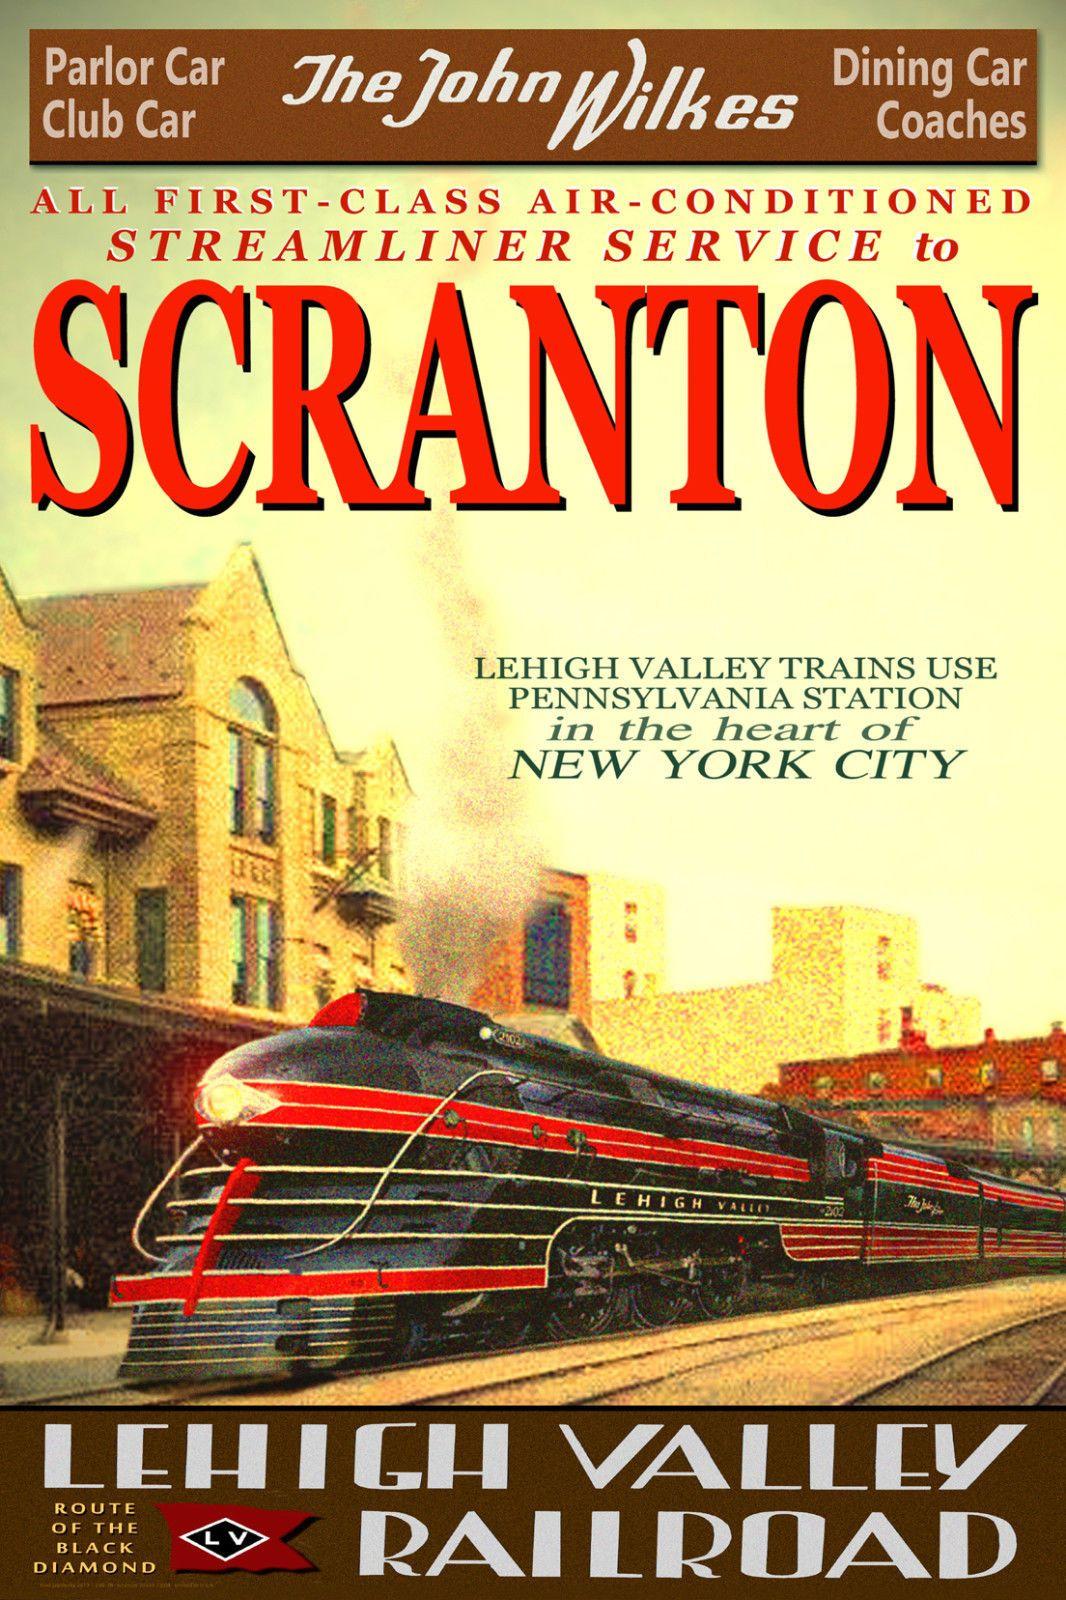 SCRANTON Pennsy Lehigh Valley Railroad JOHN WILKES Train Poster Art Print 124